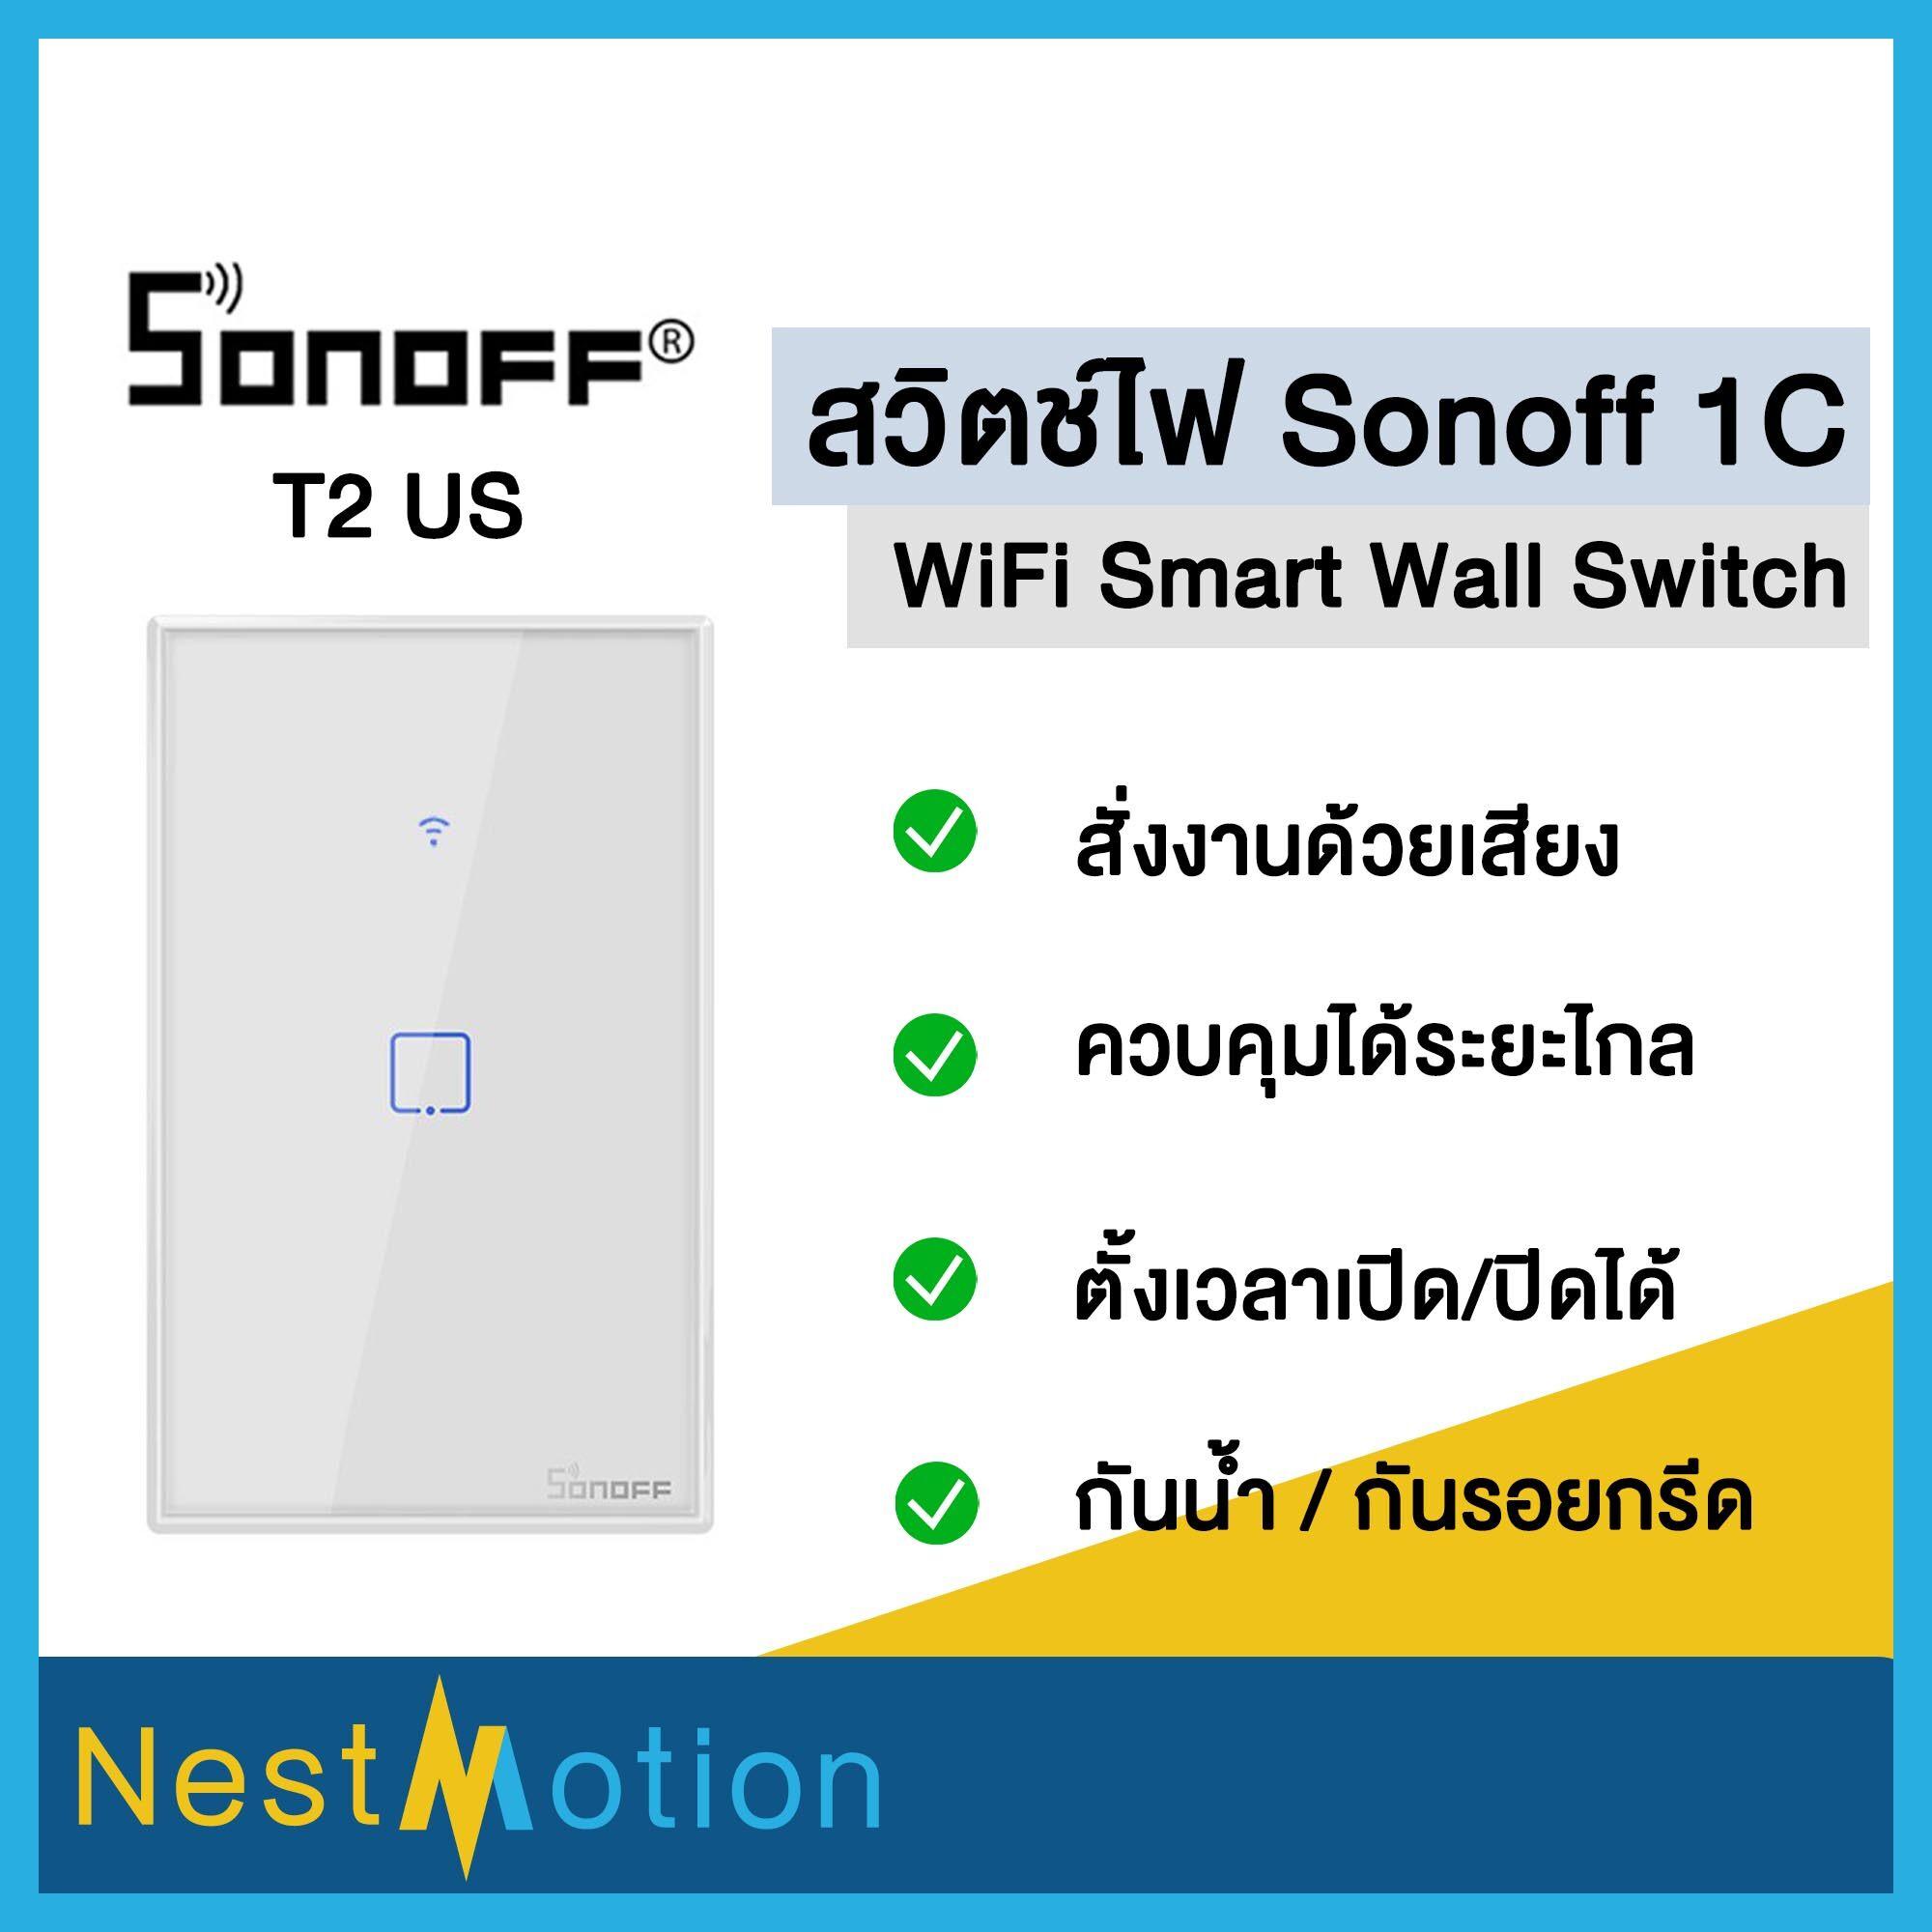 Sonoff wifi switch Sonoff T2 , Sonoff T3 สวิทต์สัมผัสแบบ 1 , 2 , 3 สวิทต์ ต้องใช้สาย N ในการติดตั้ง